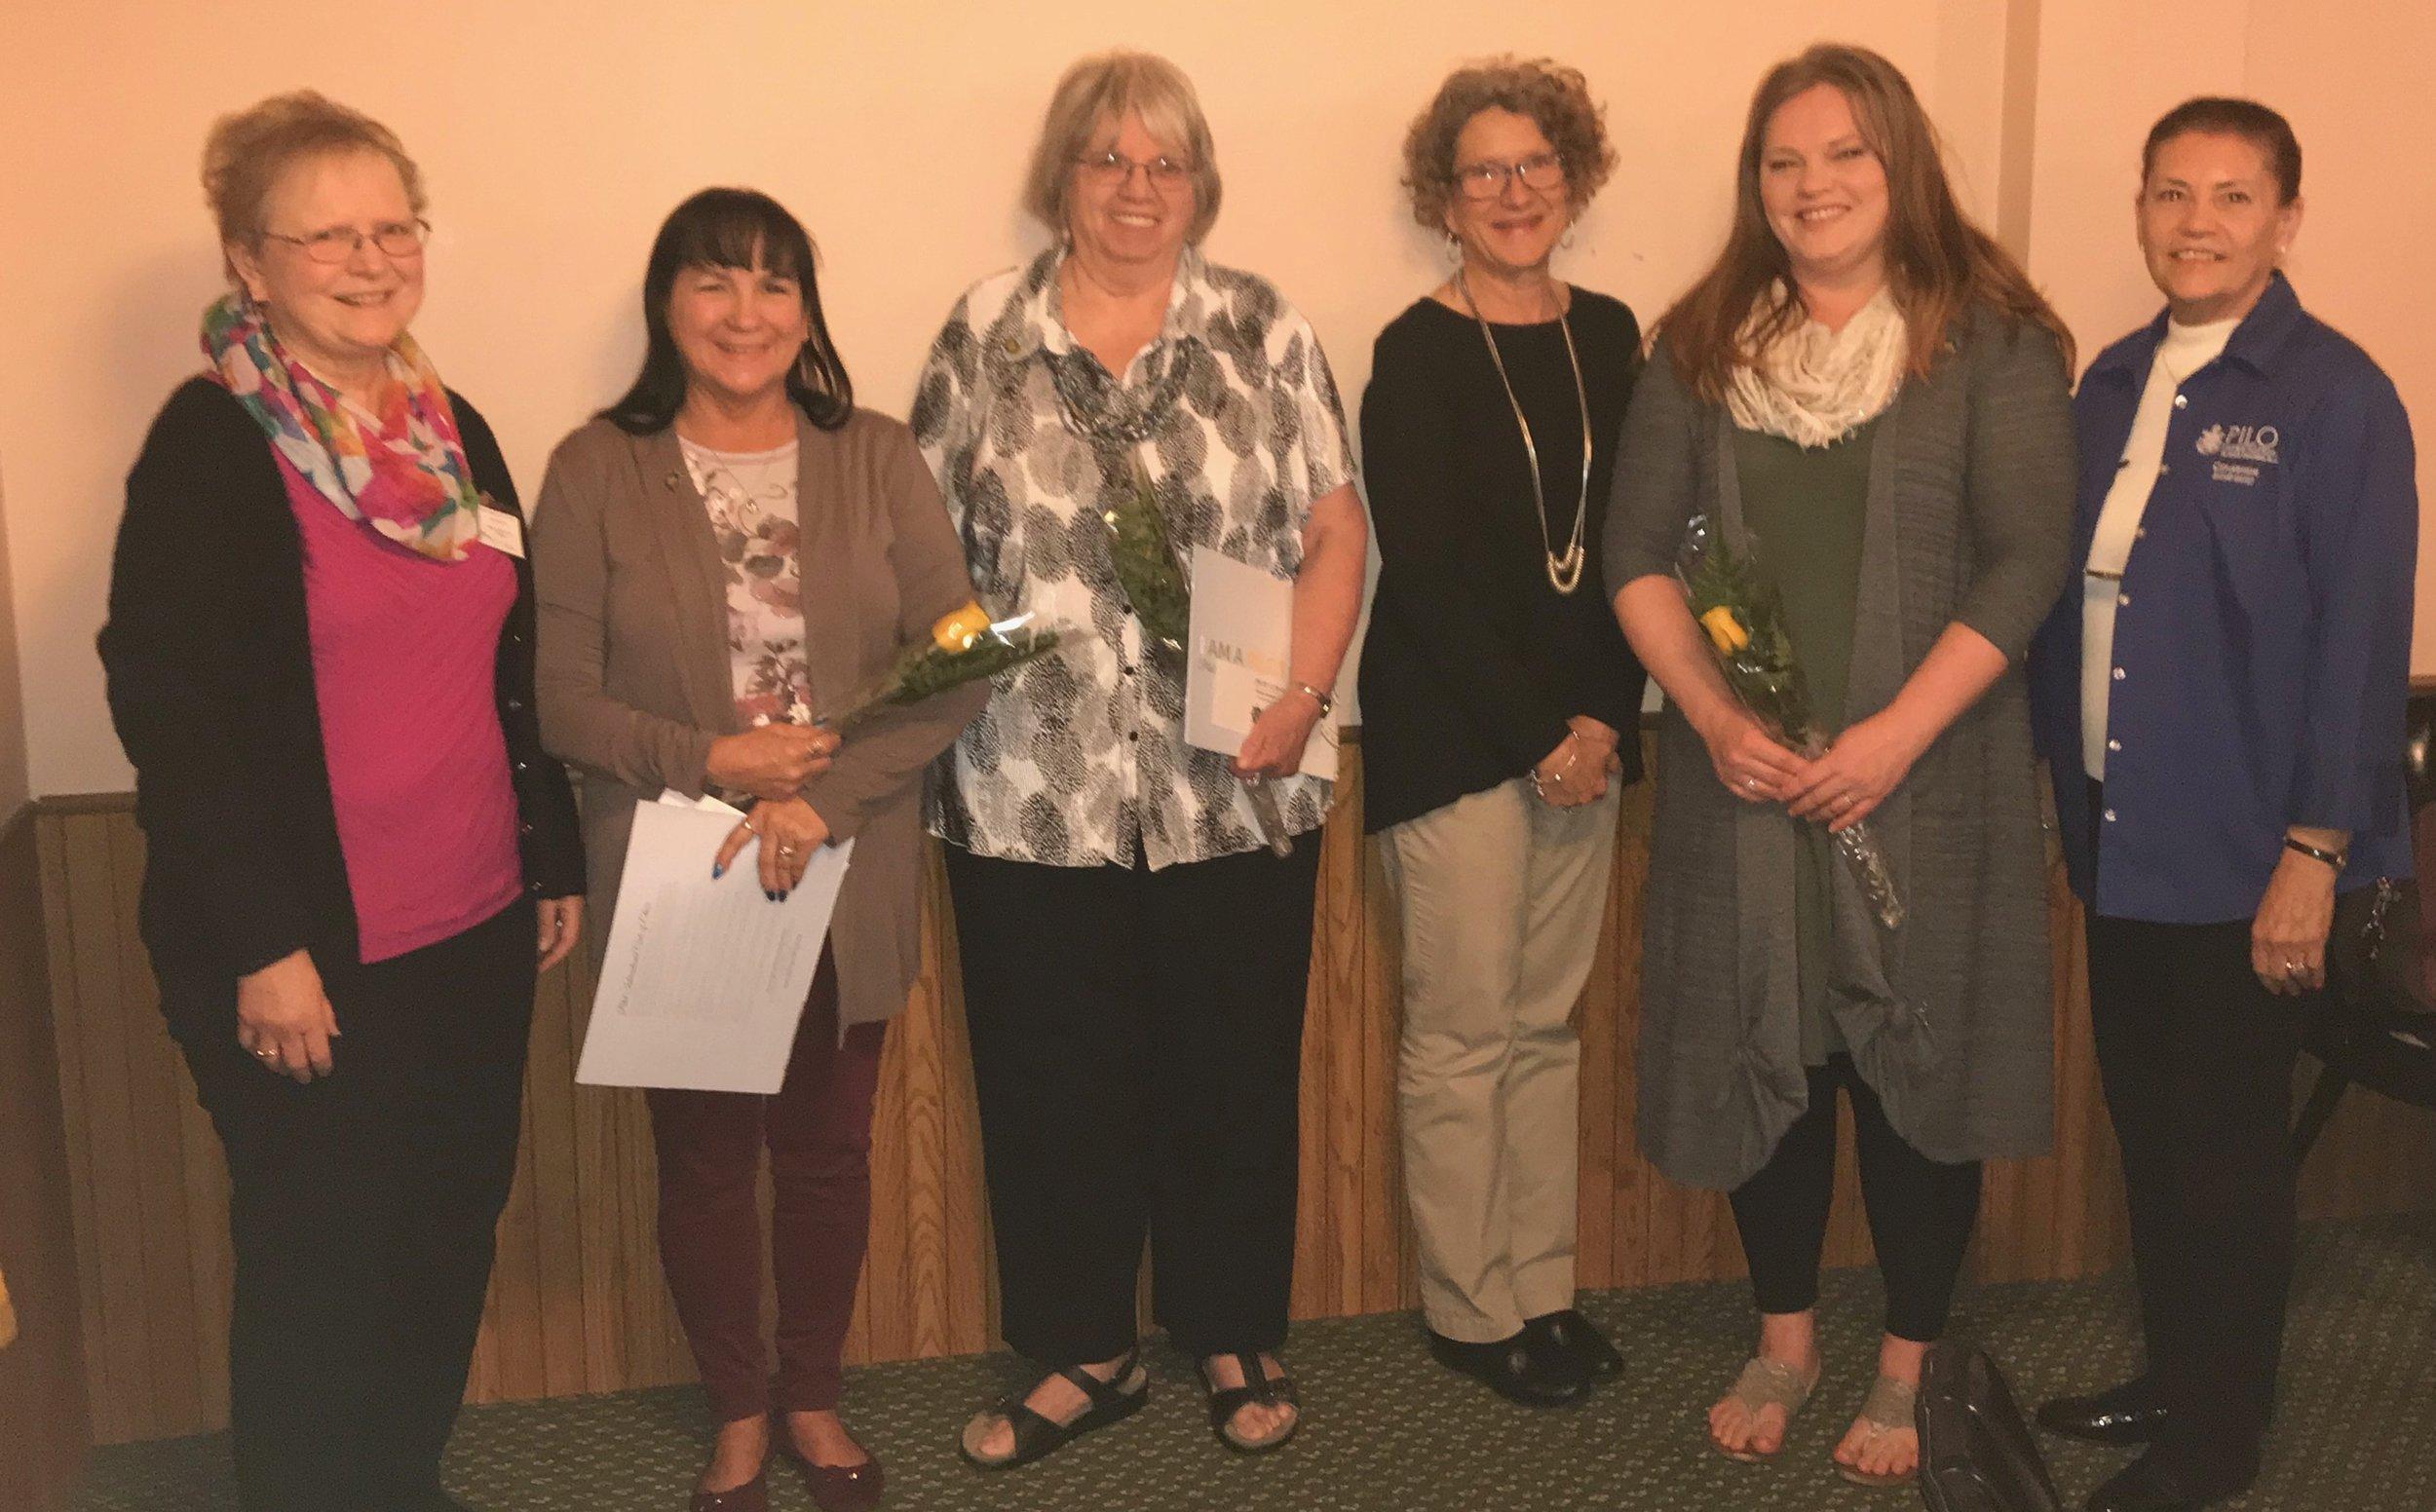 Joyce Fry sponsored Dee Krier, Billie Bonomo sponsored by Sally O'Connor and Nicci Henderson sponsored by Renee Johnson